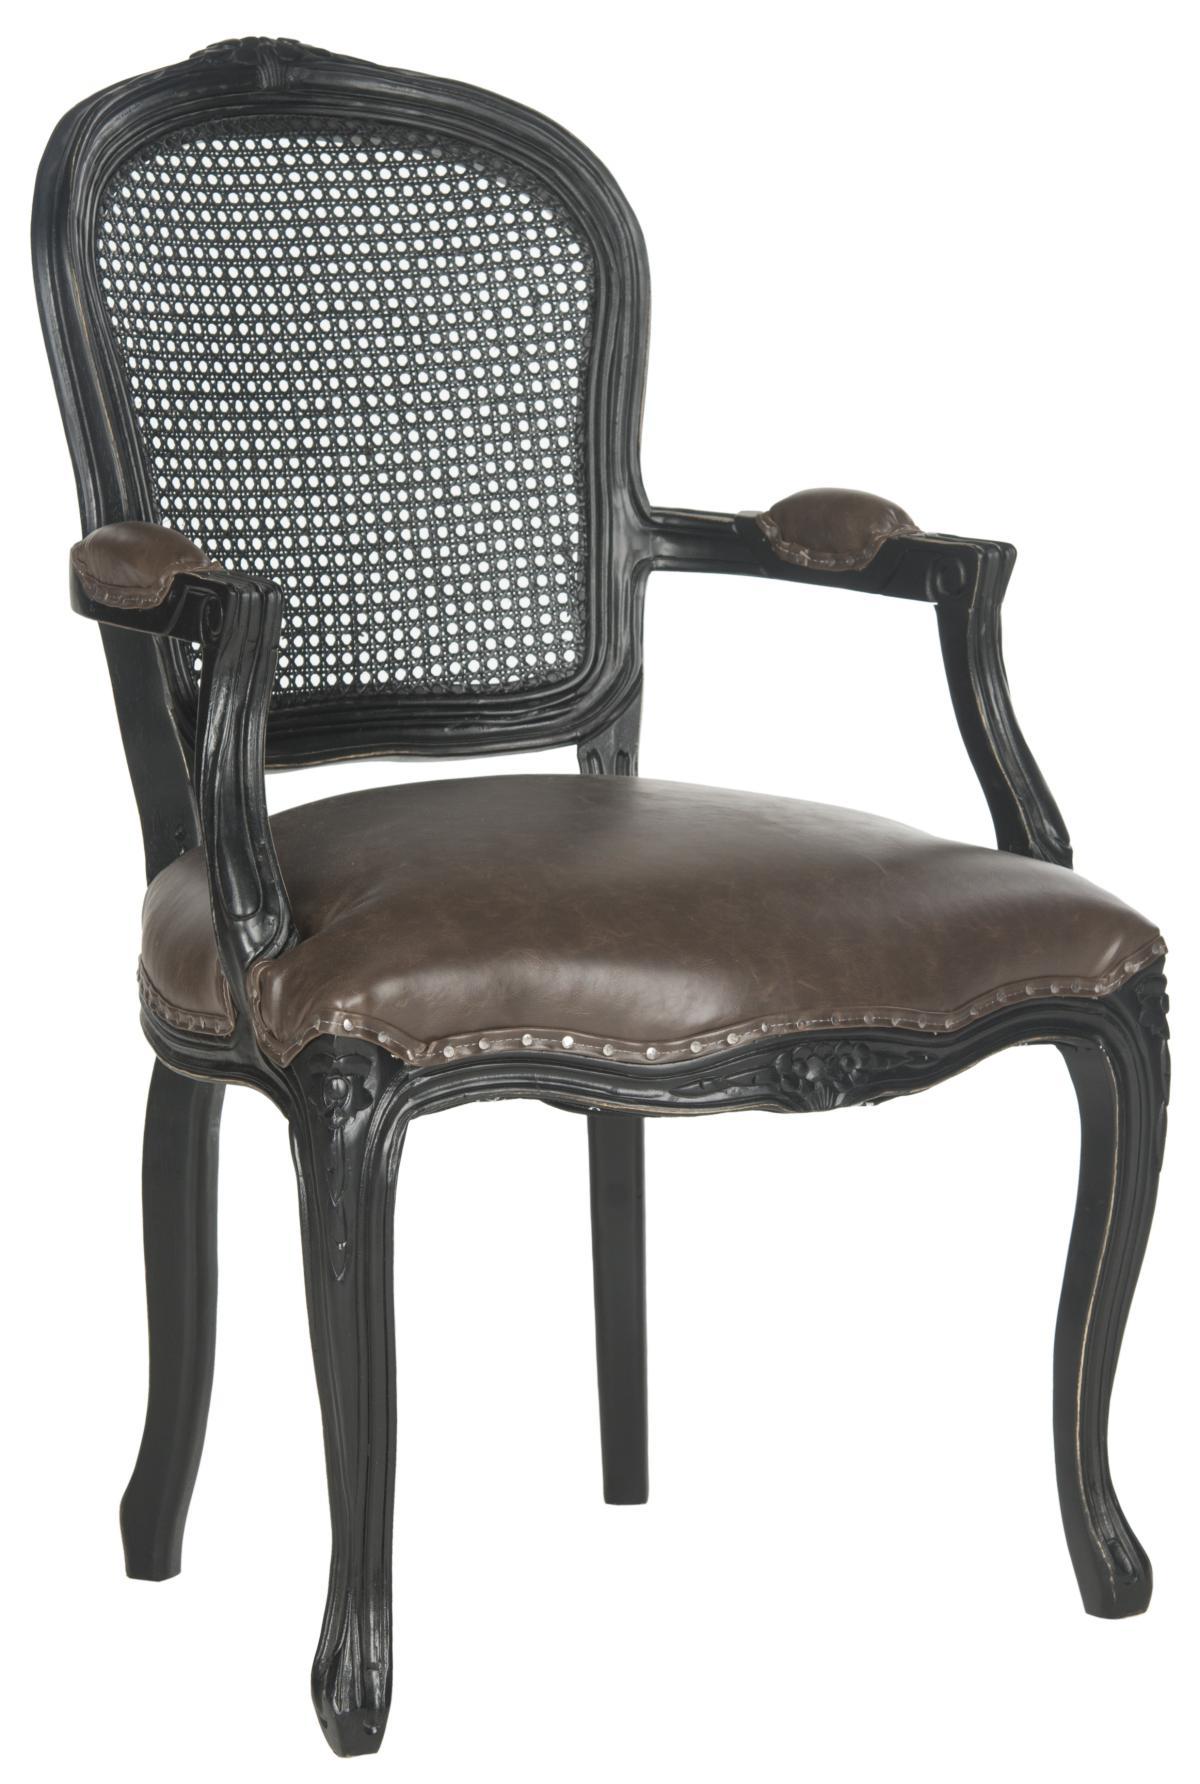 Safavieh MCR4576C MCKENNA ARM CHAIR $801 00 Accent Chairs